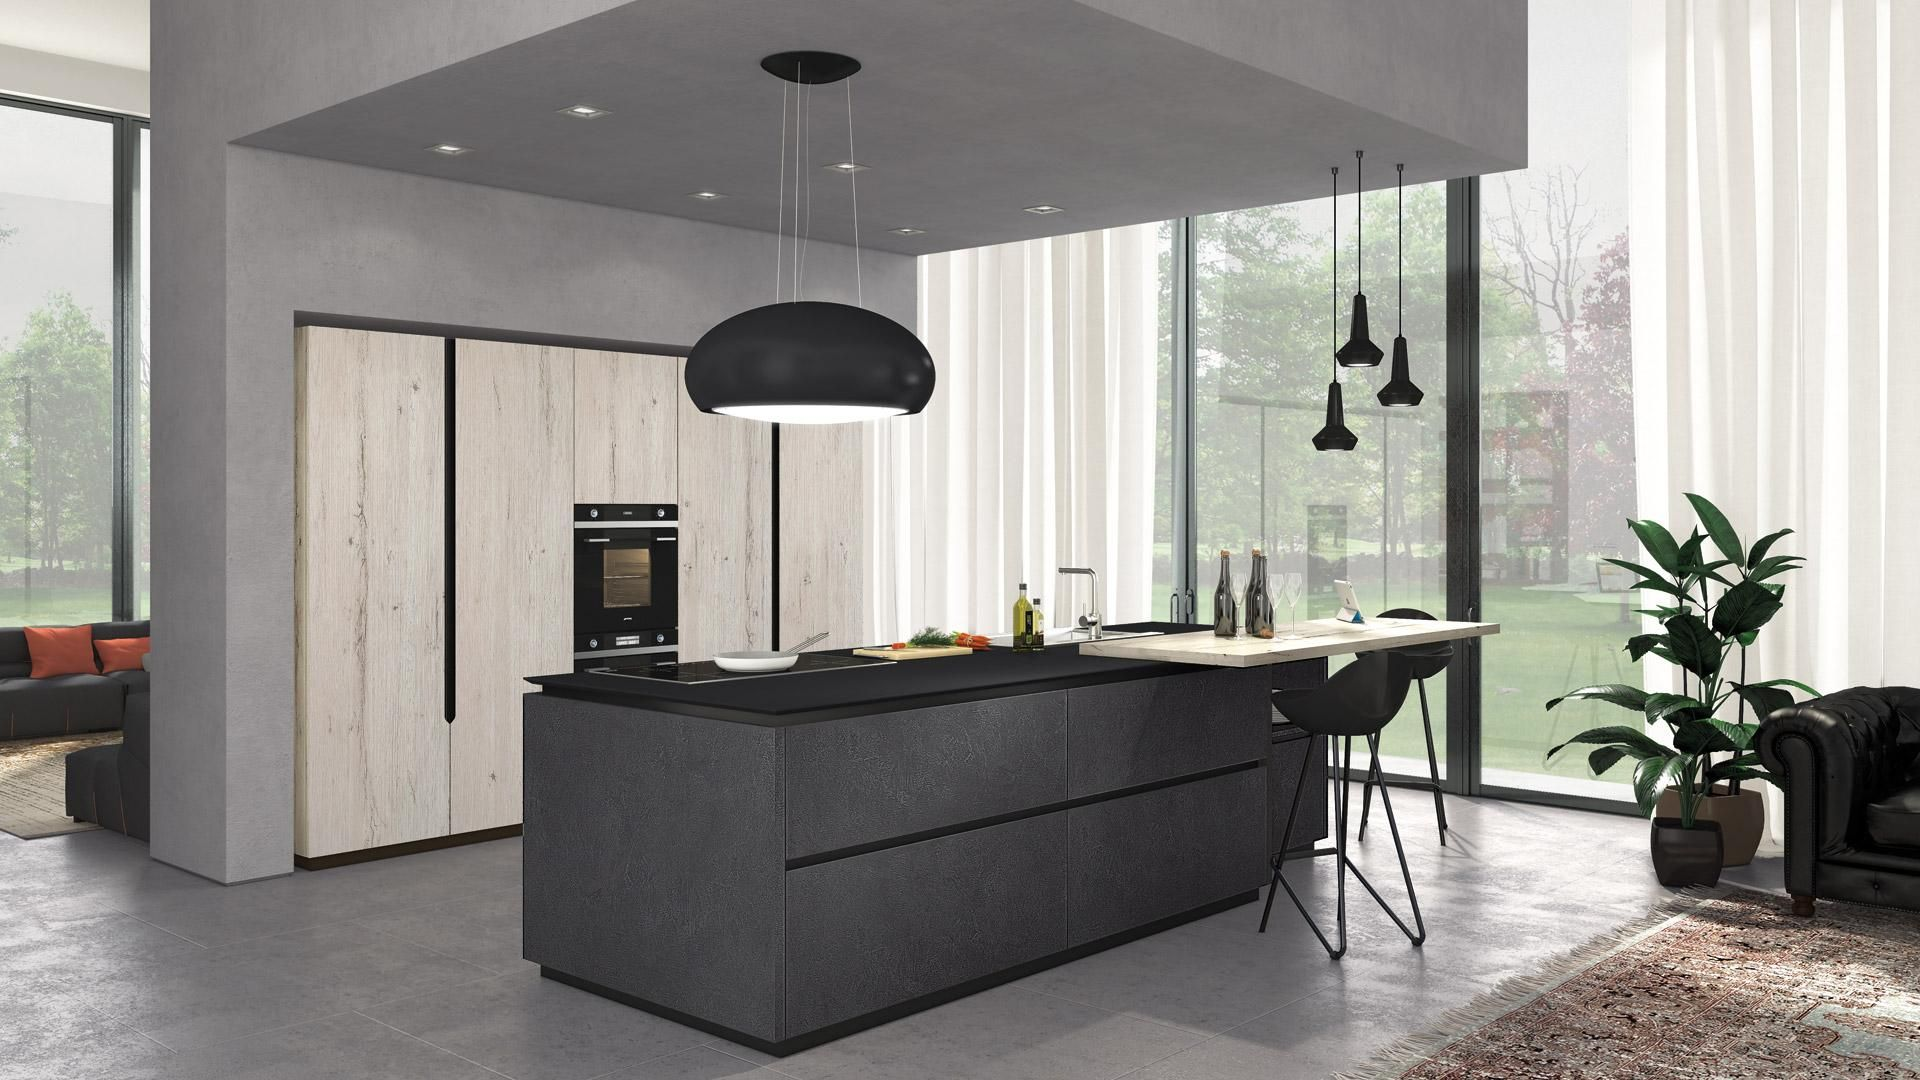 Oltre - Cucine Moderne - Cucine Lube | Idee per la casa | Pinterest